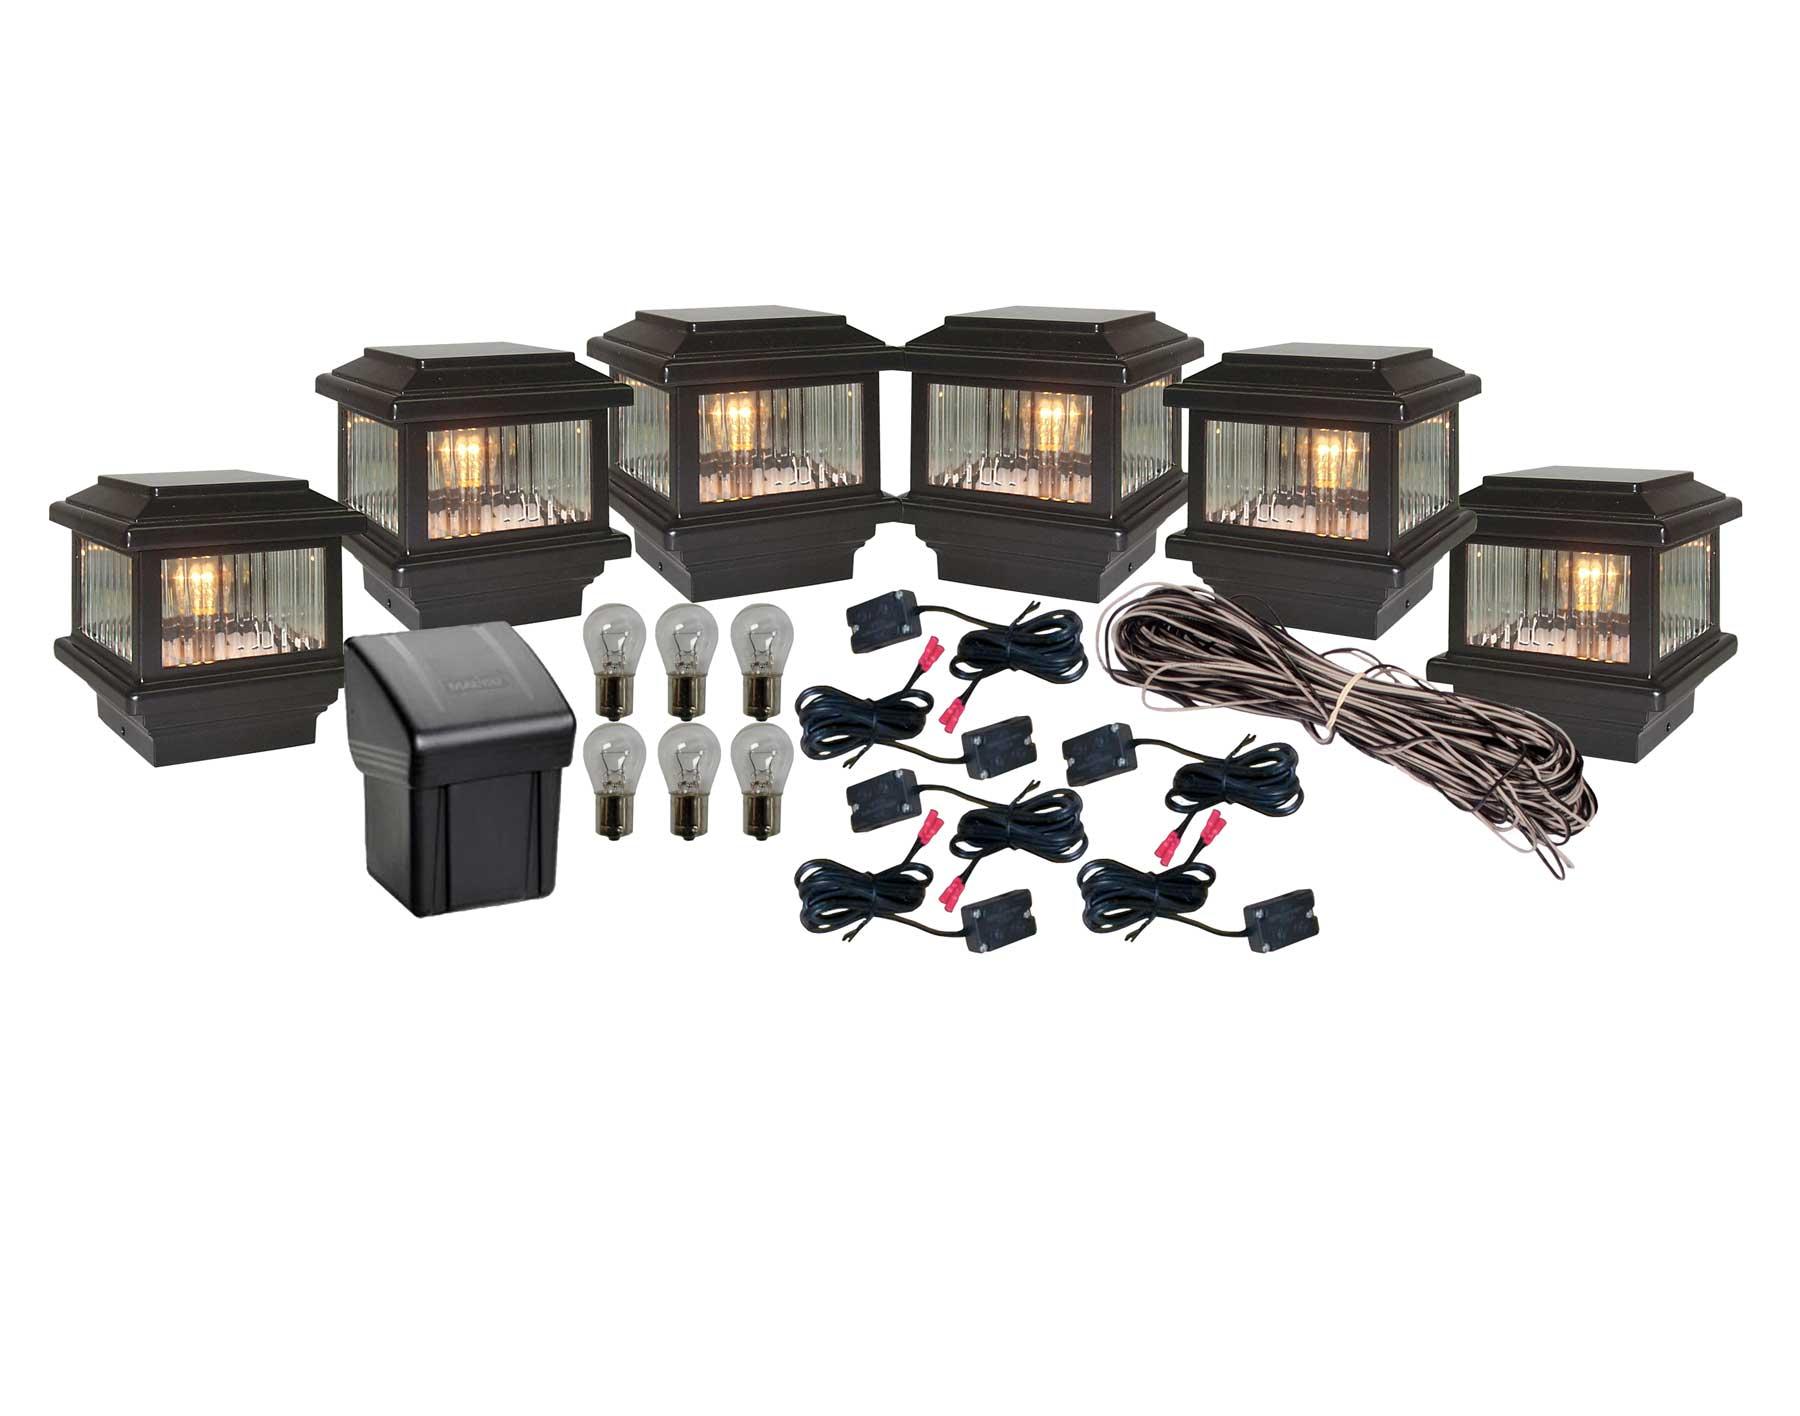 Titan 6 post cap led light installation kit mozeypictures Choice Image